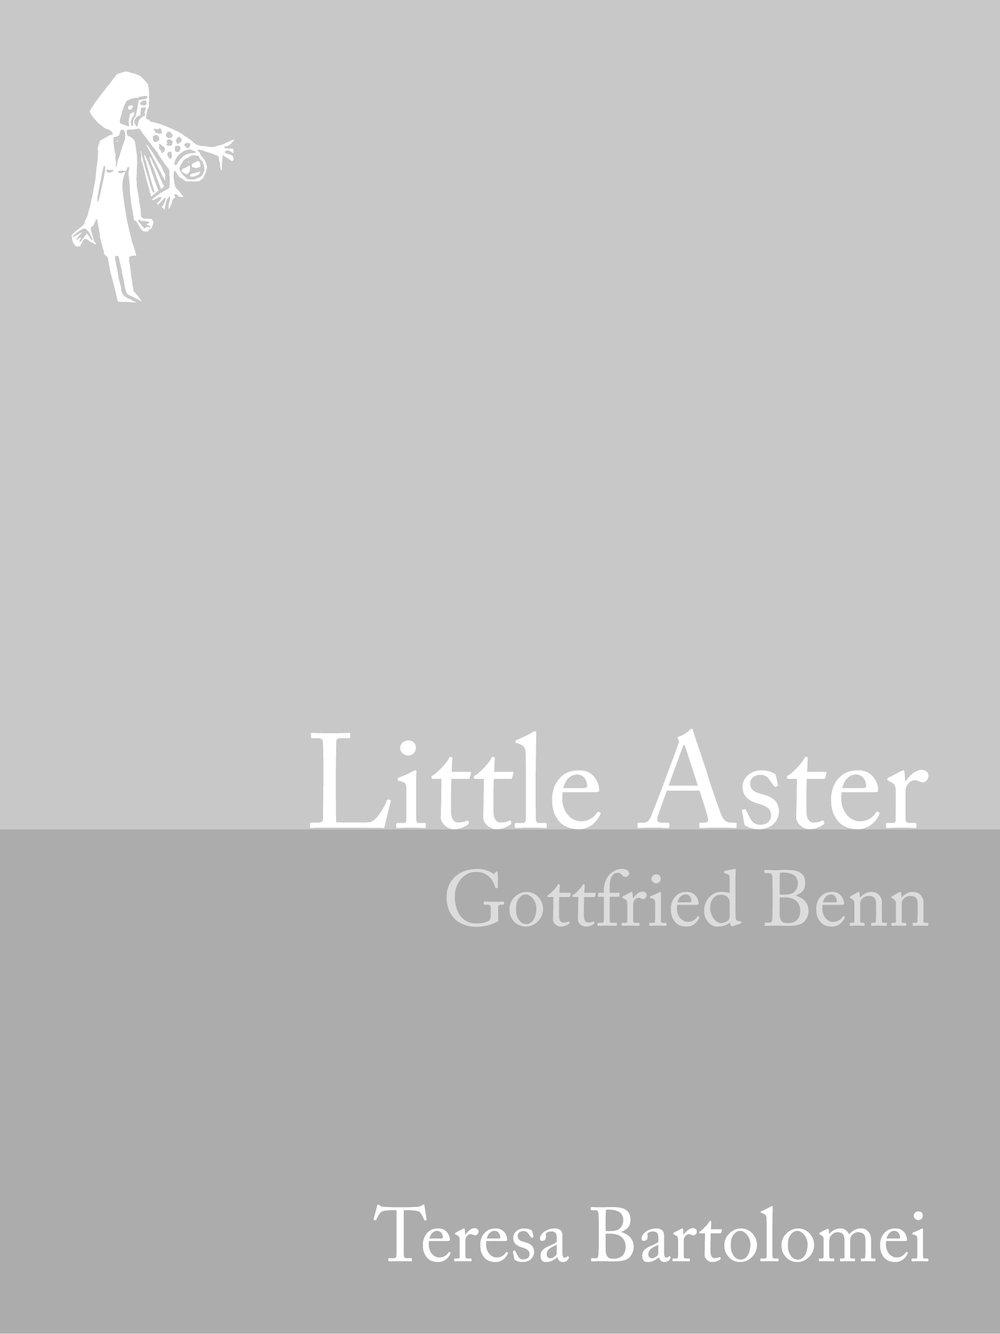 littleasterTB.jpg